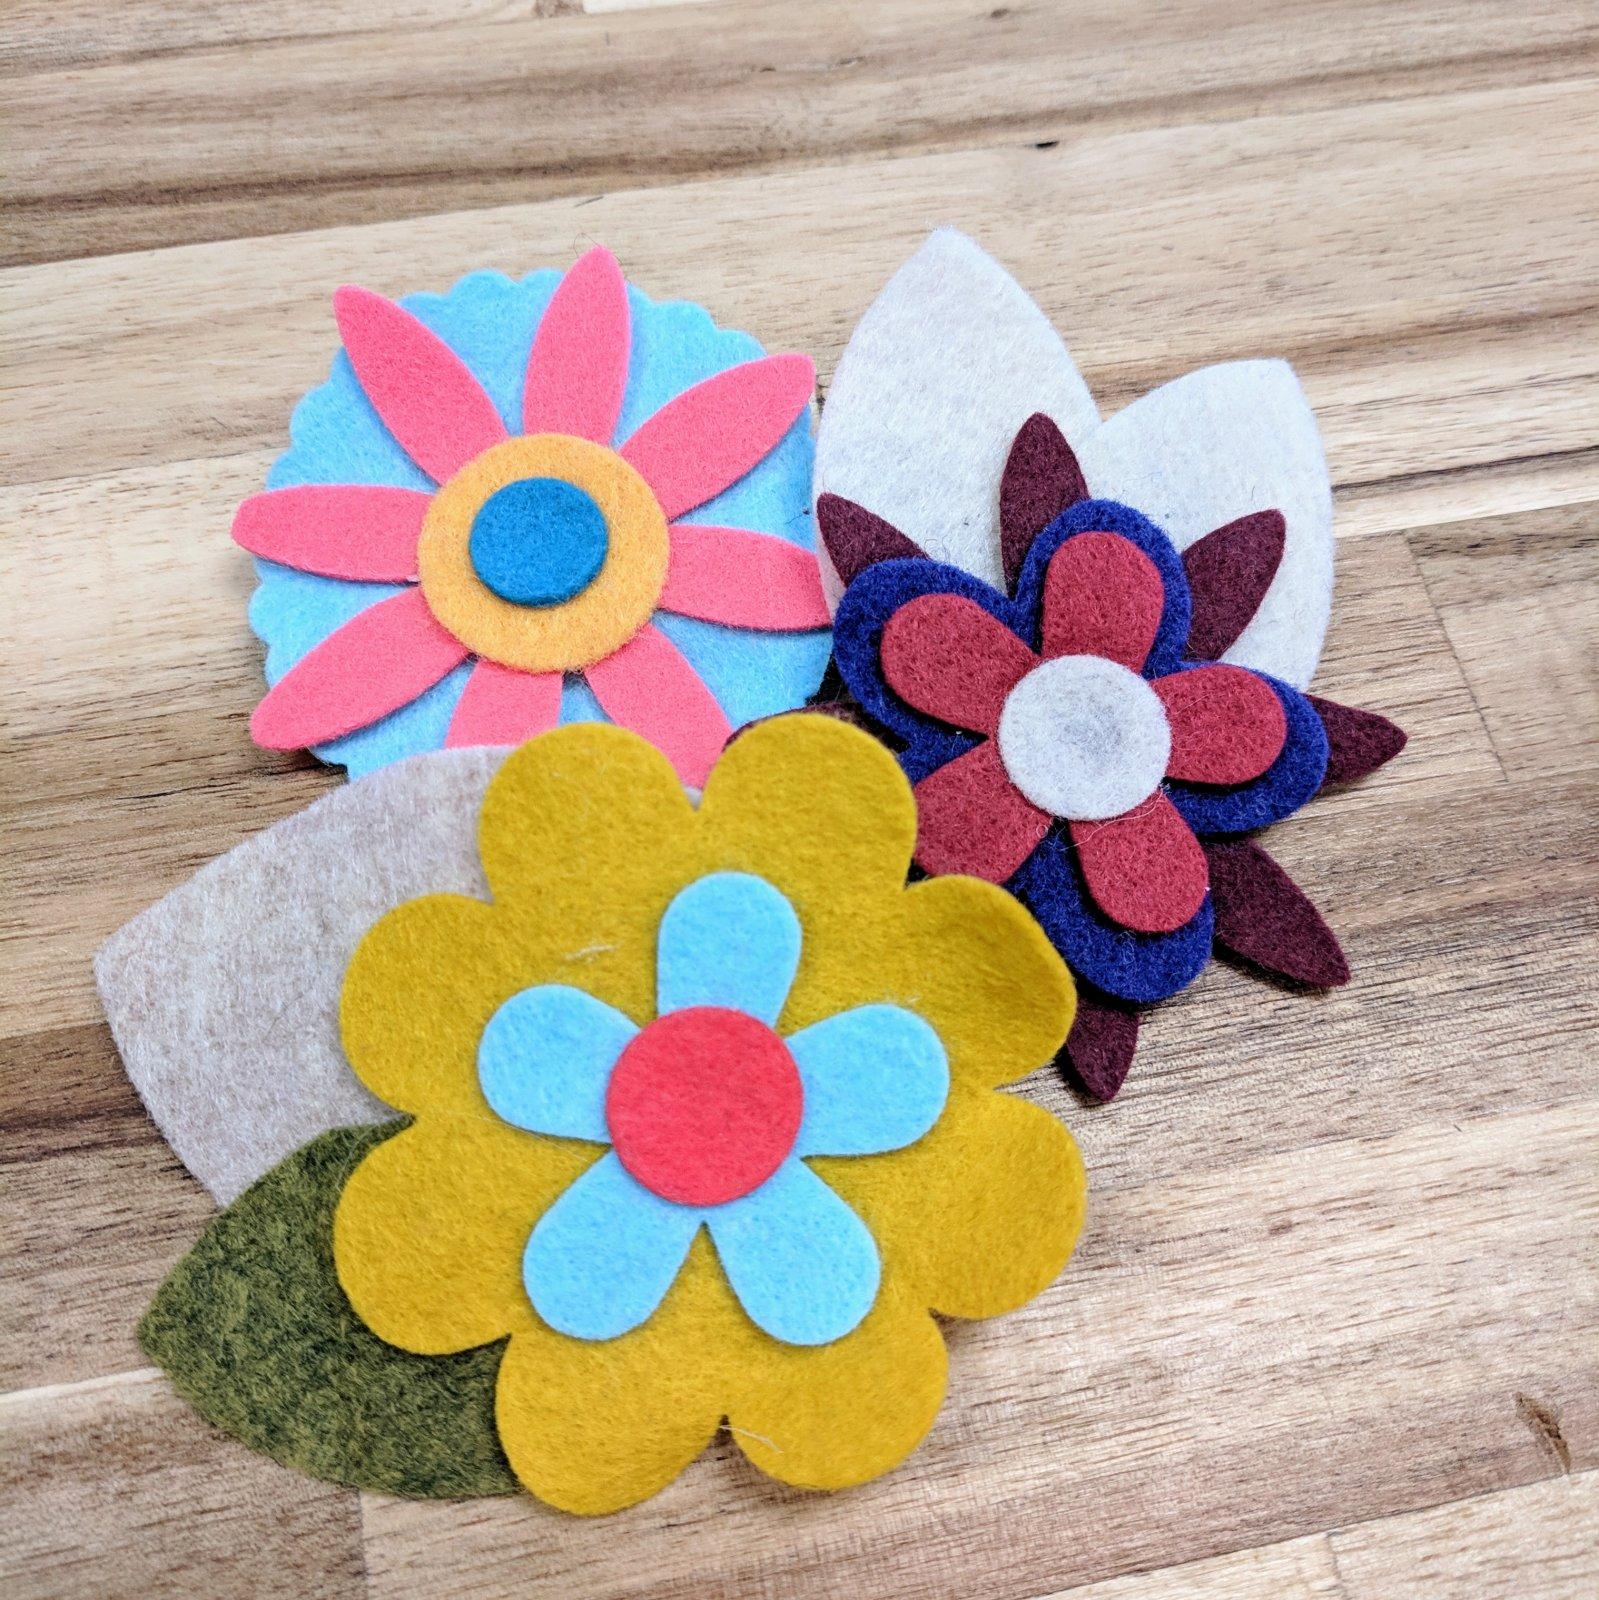 Felt Flower Kits